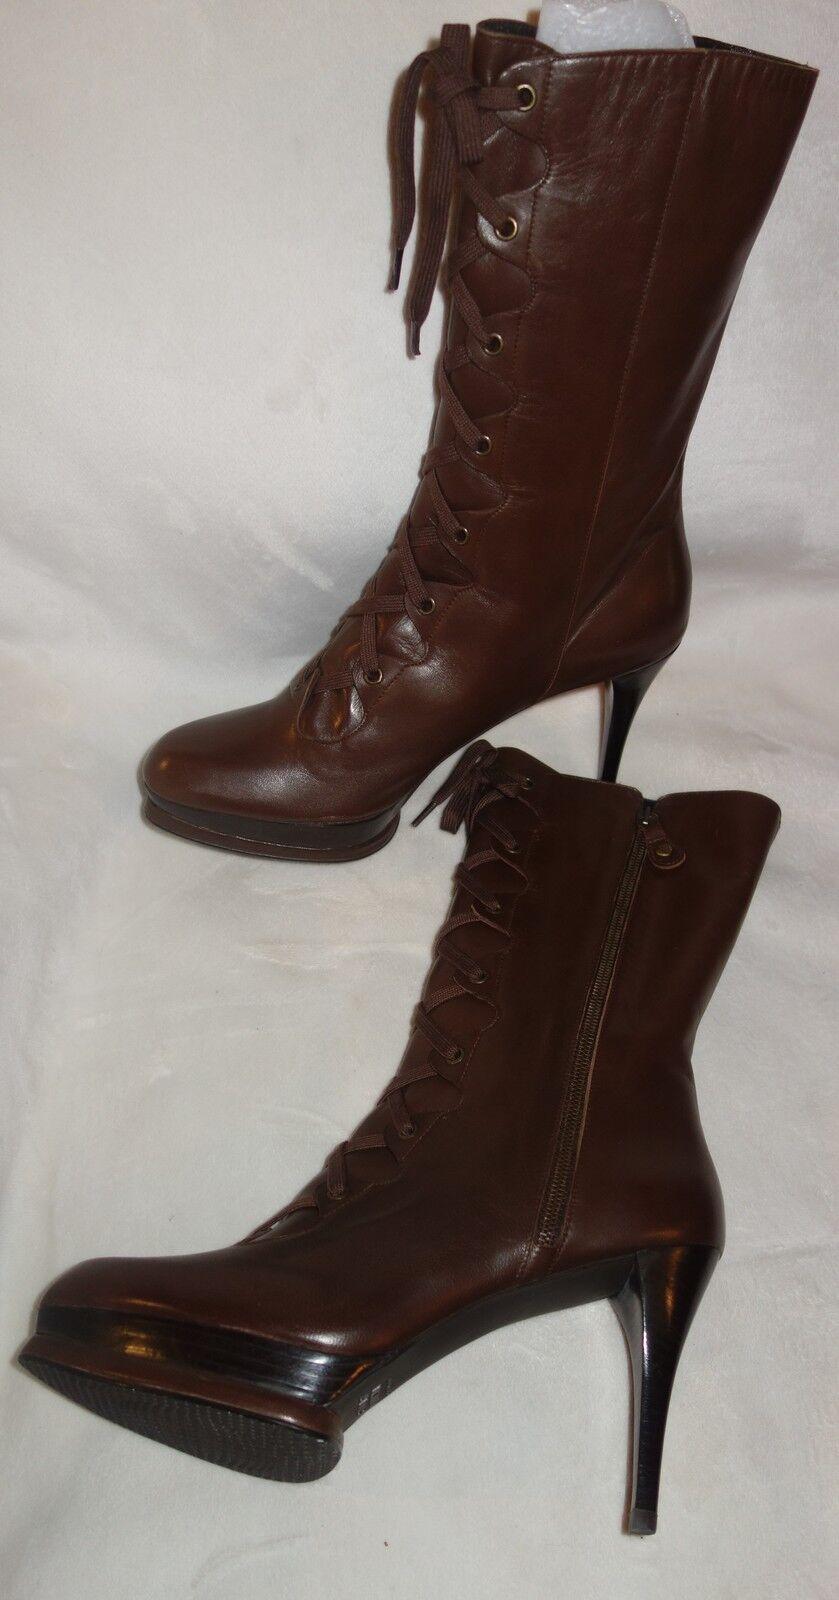 stuart weitzman  oiled nappa boots Shoes sz 41 new